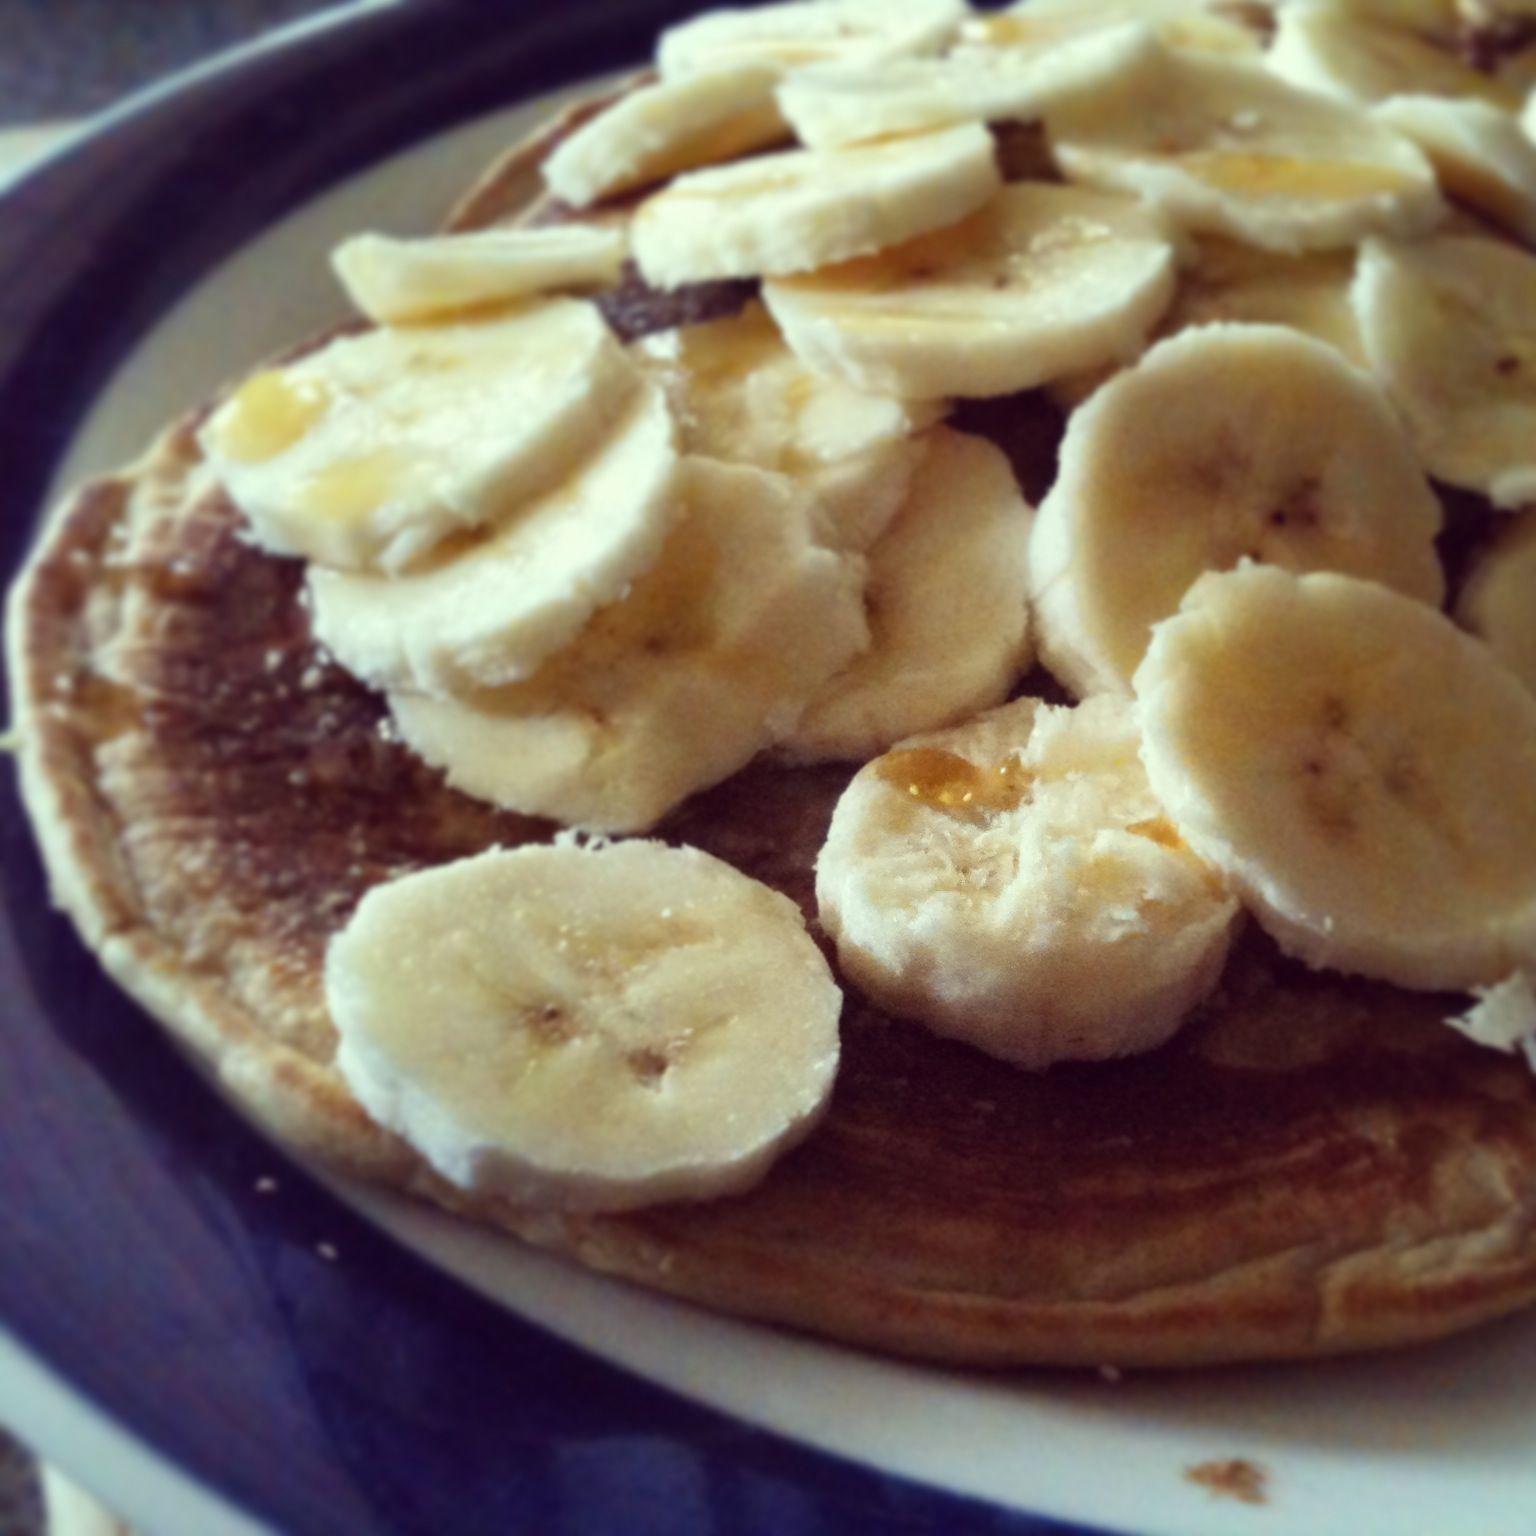 The best #glutenfree #vegan pancakes I've ever made! Recipe on facebook & Instagram - A Healthy Food Affair :)